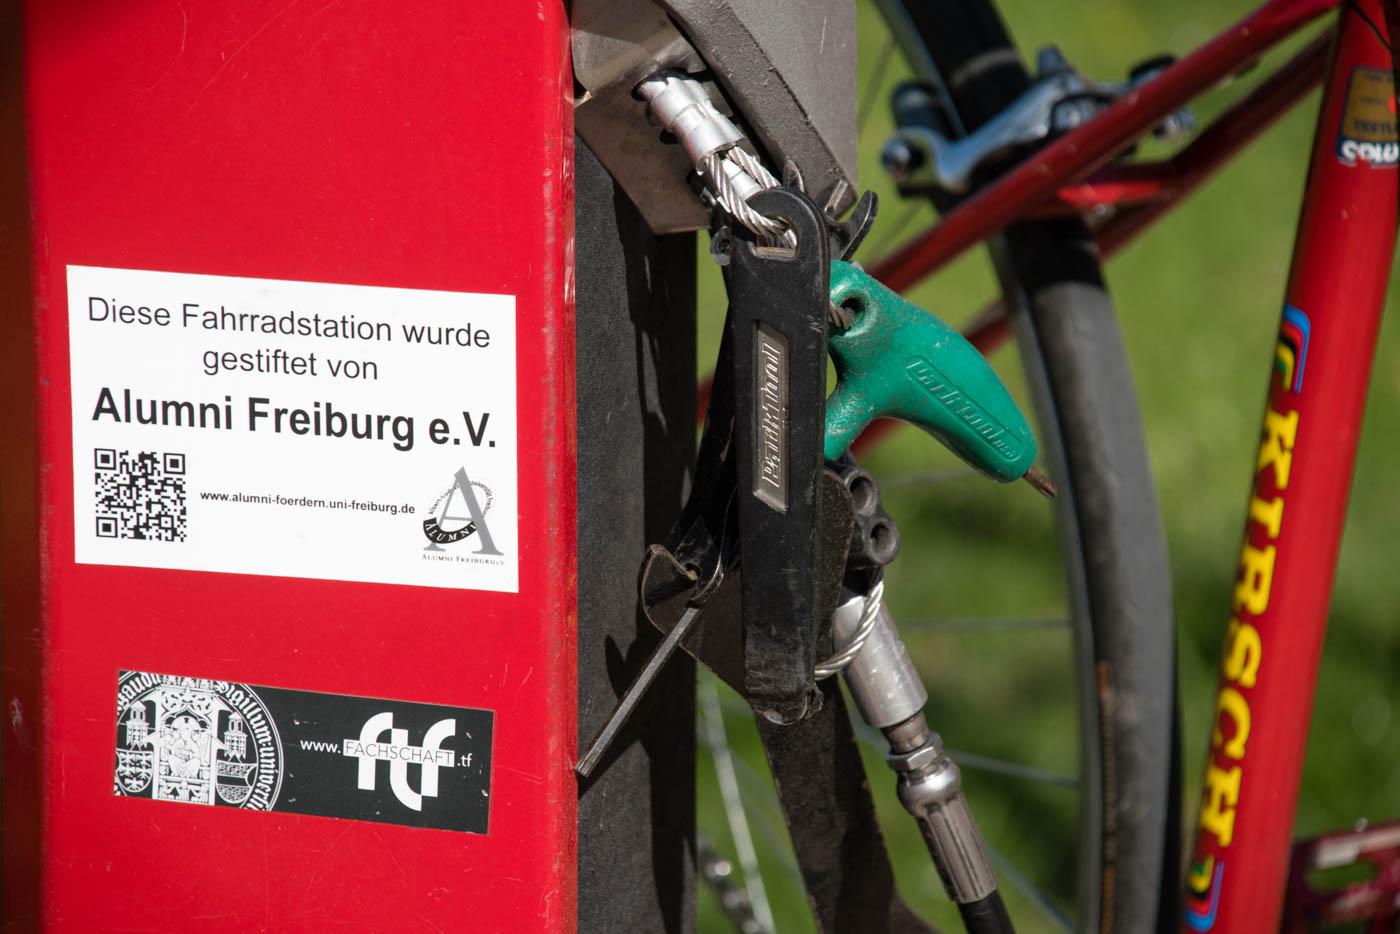 Fahrradstation von nahem mit Schild: Alumni Freiburg e.V.